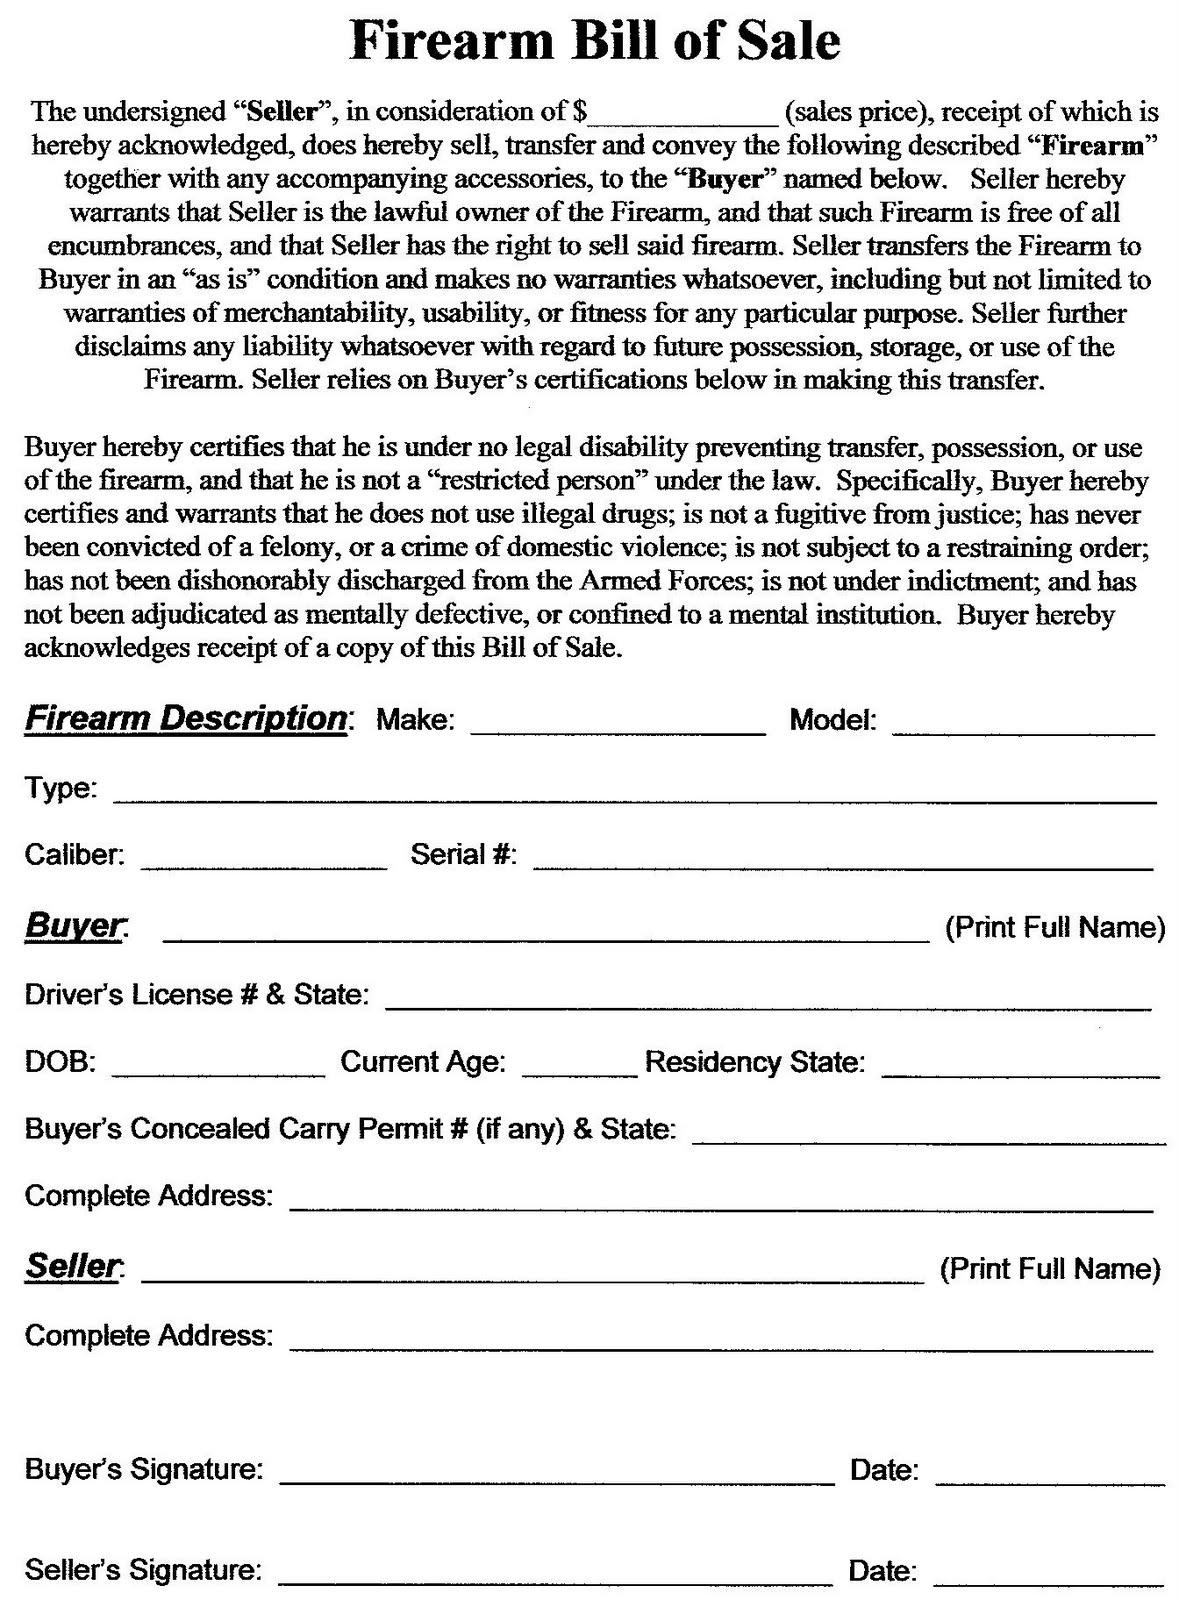 Bill Of Sale Form Gun Free | Online Automatic Resume Builder